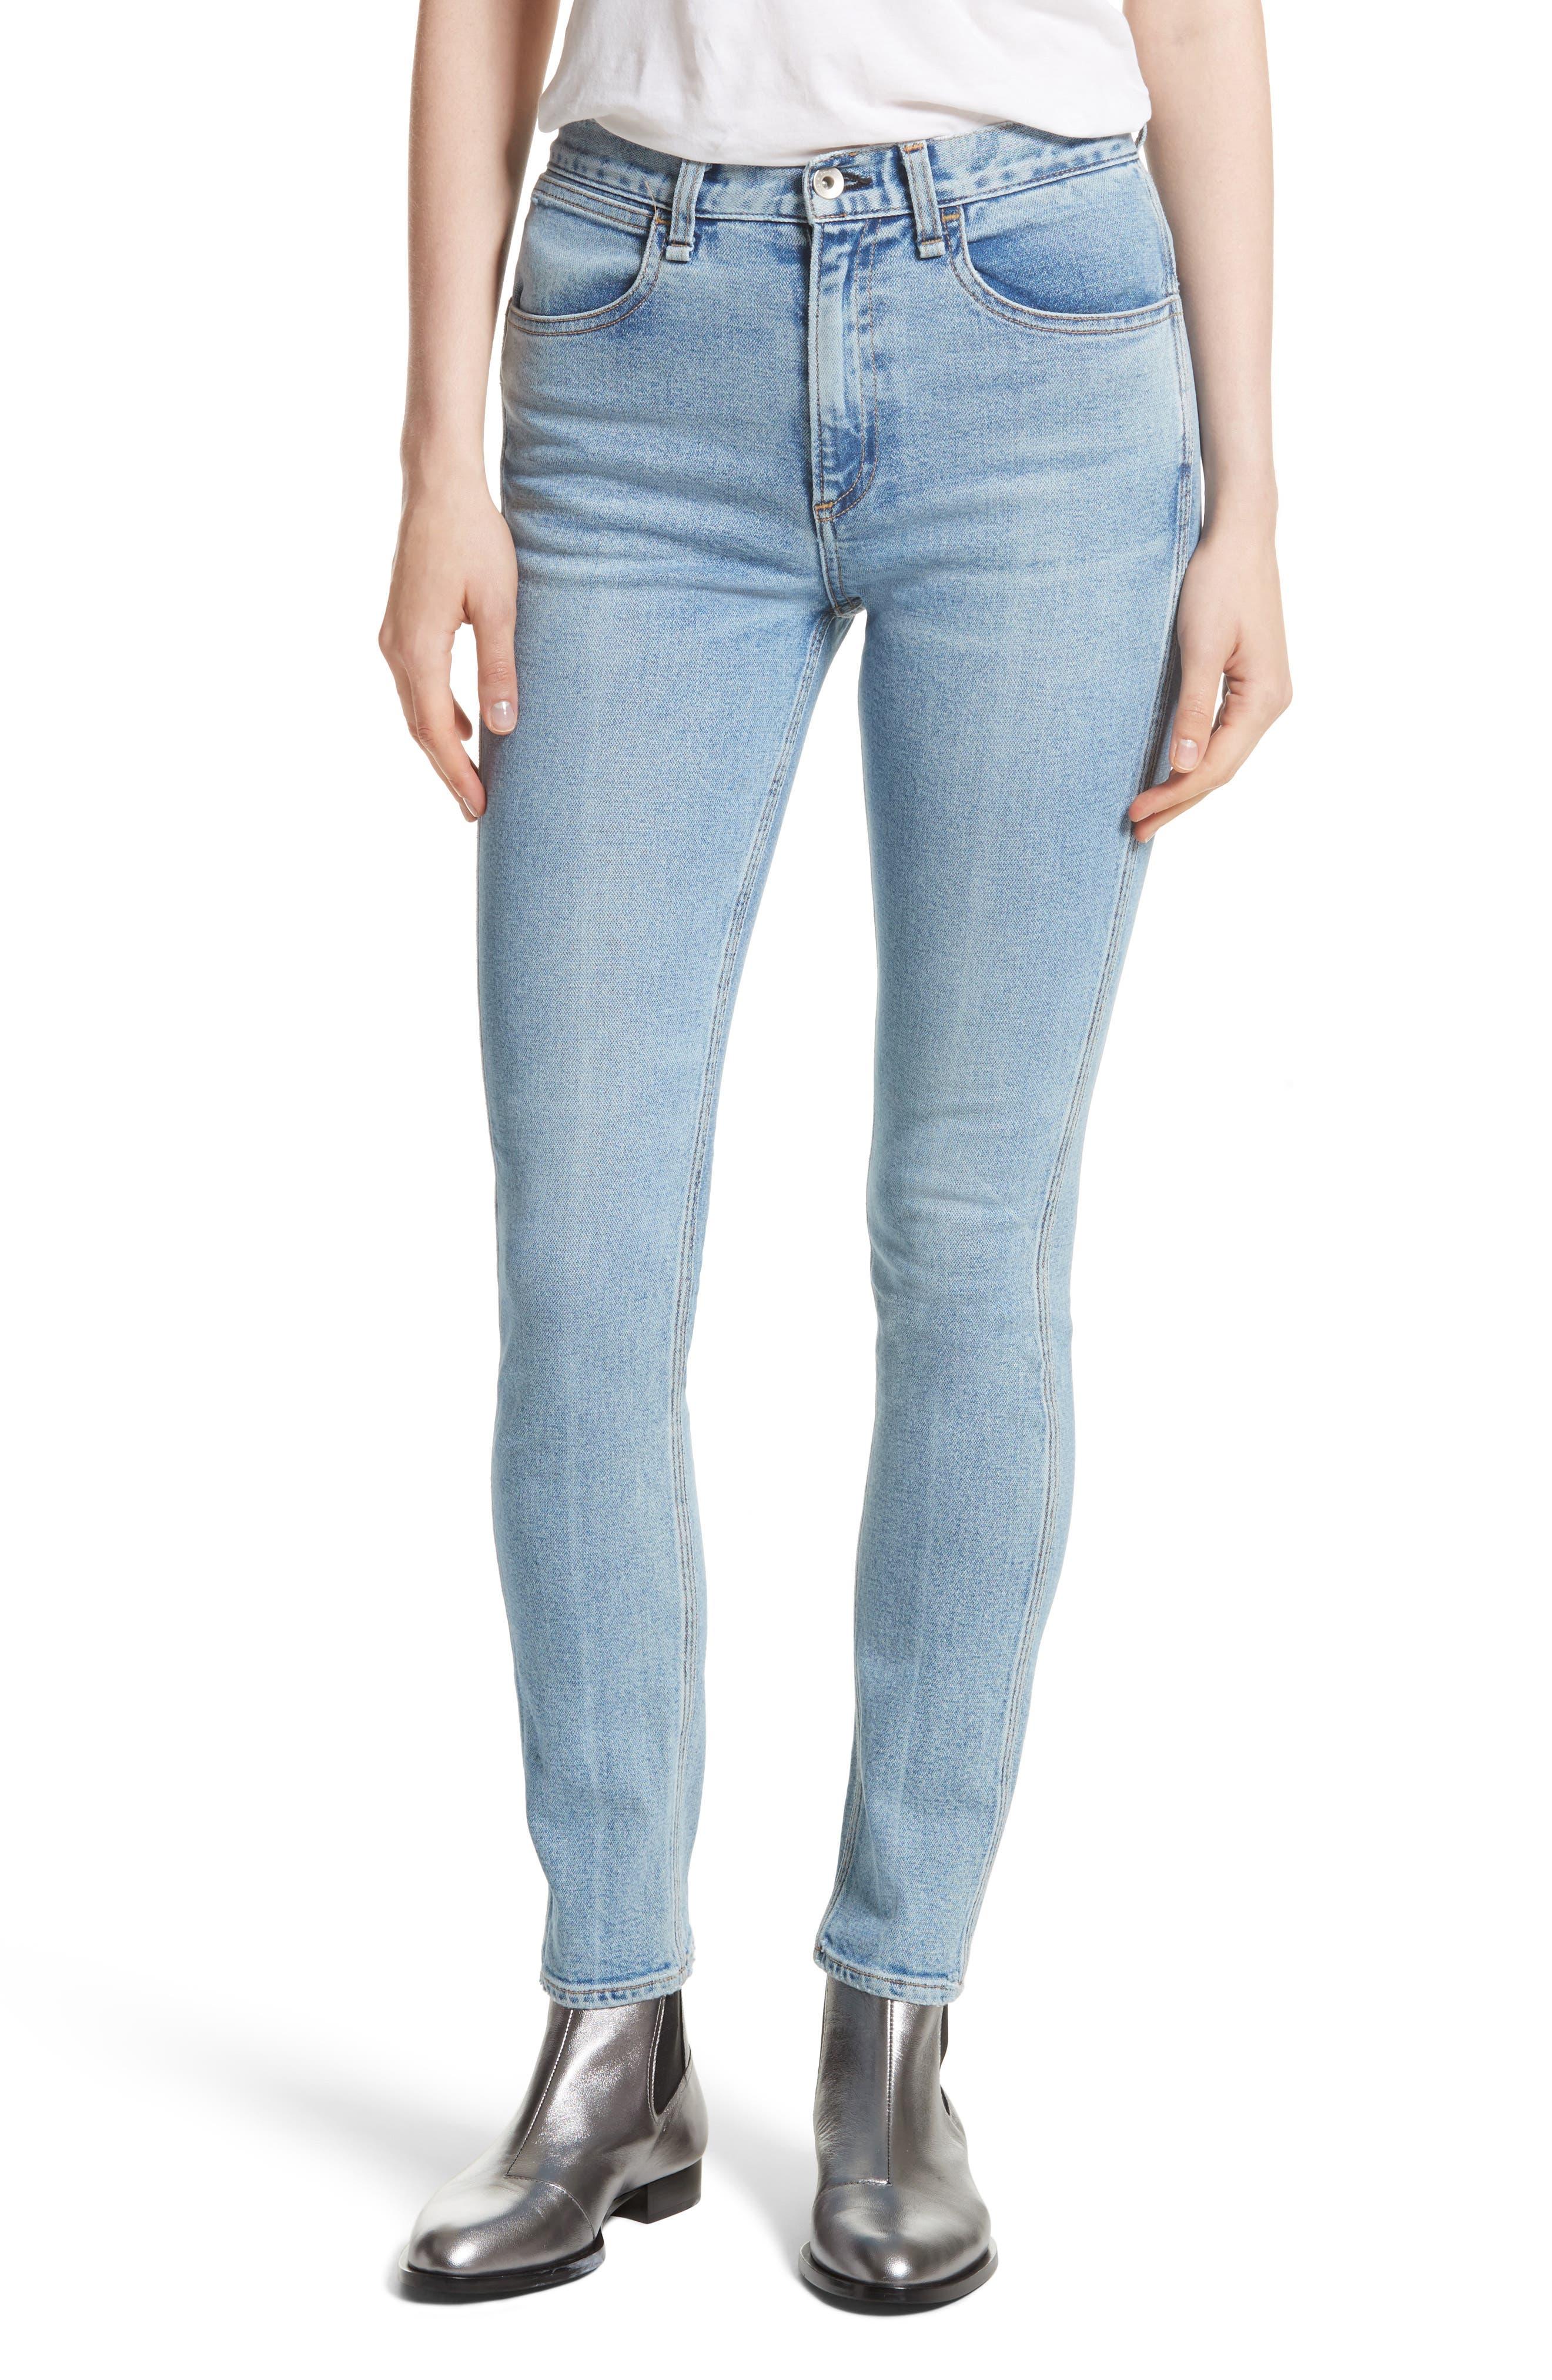 Main Image - rag & bone/JEAN Lou High Waist Skinny Jeans (Hotbird)